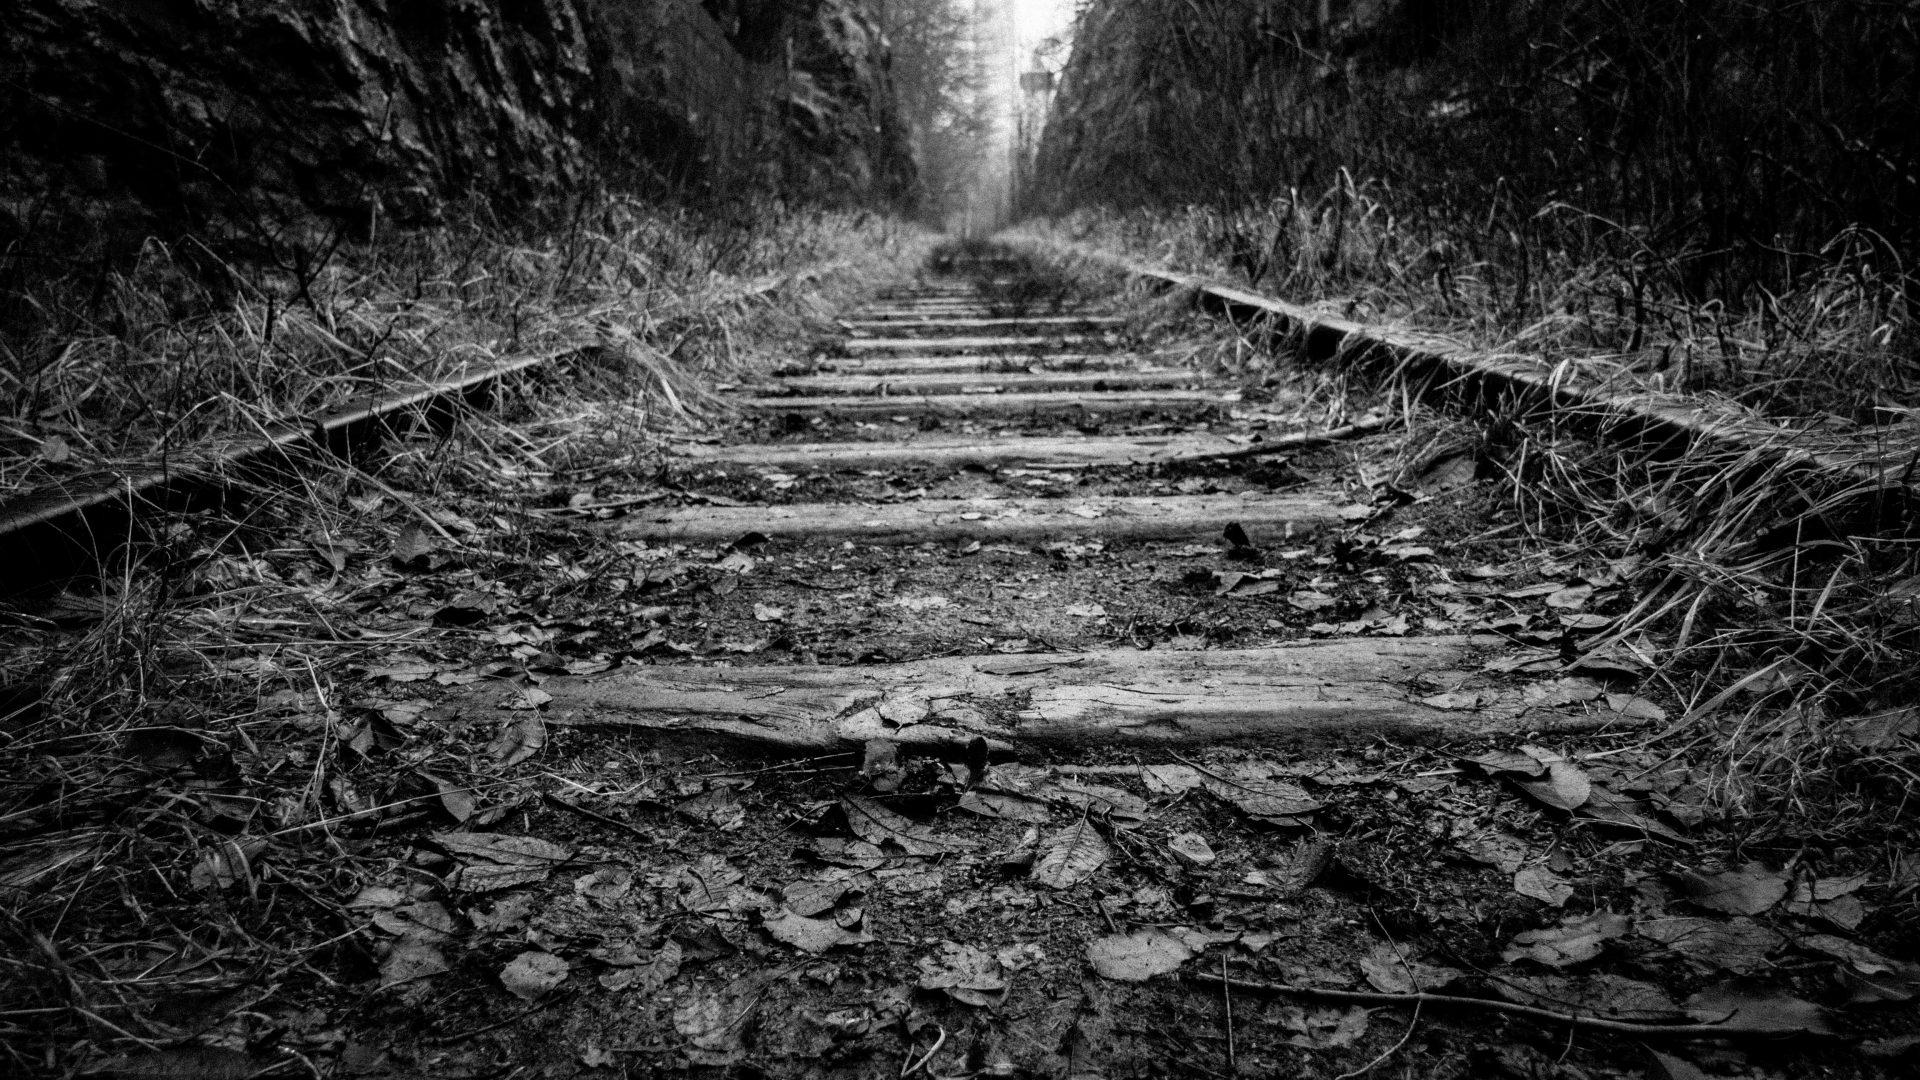 Old Rail Track Wallpaper 4K Background HD Wallpaper